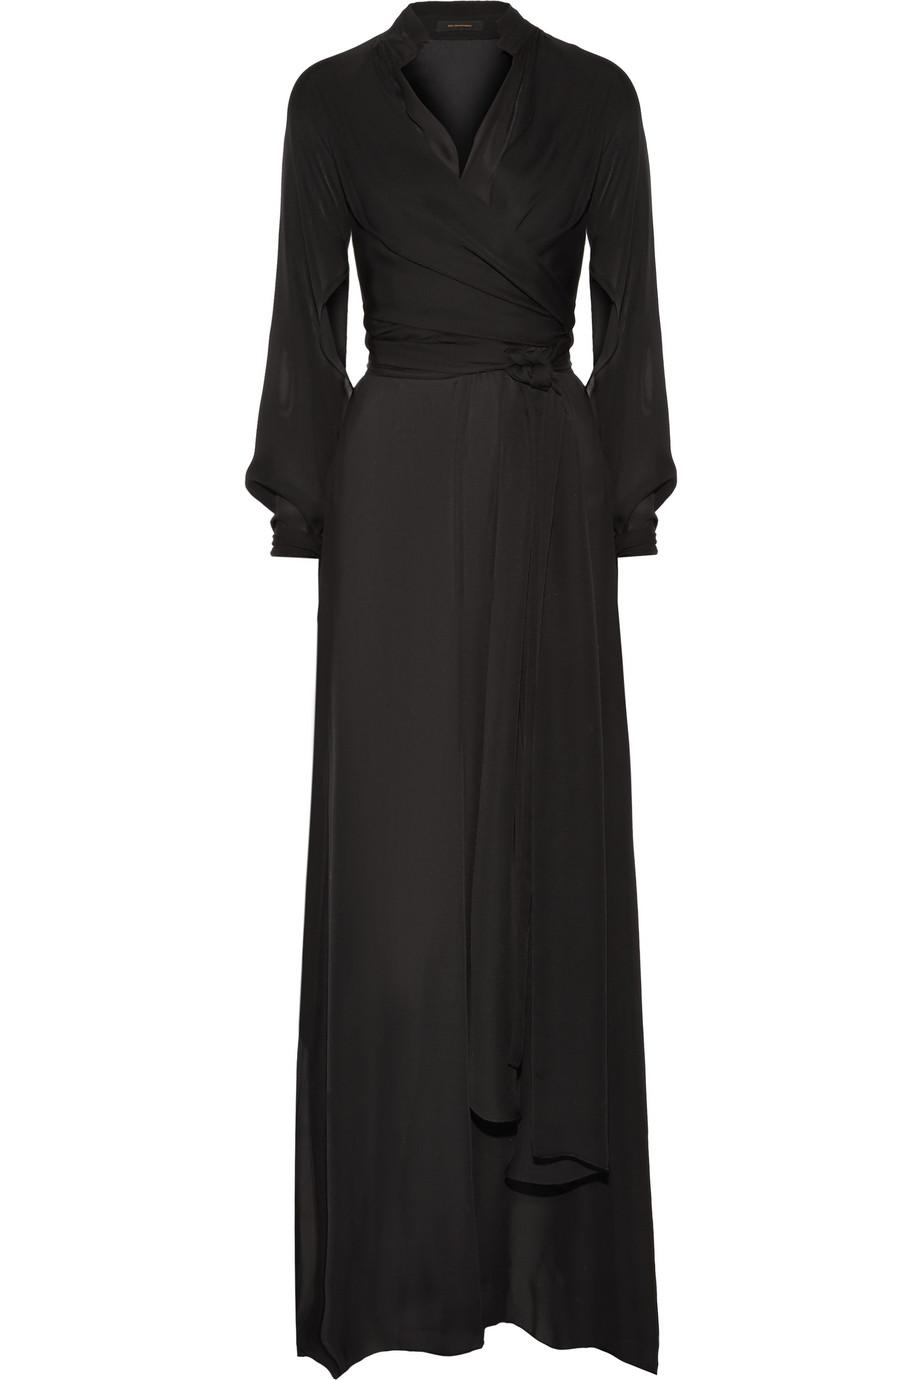 Moroccan Wrap-Effect Silk Gown, Black, Women's, Size: 0